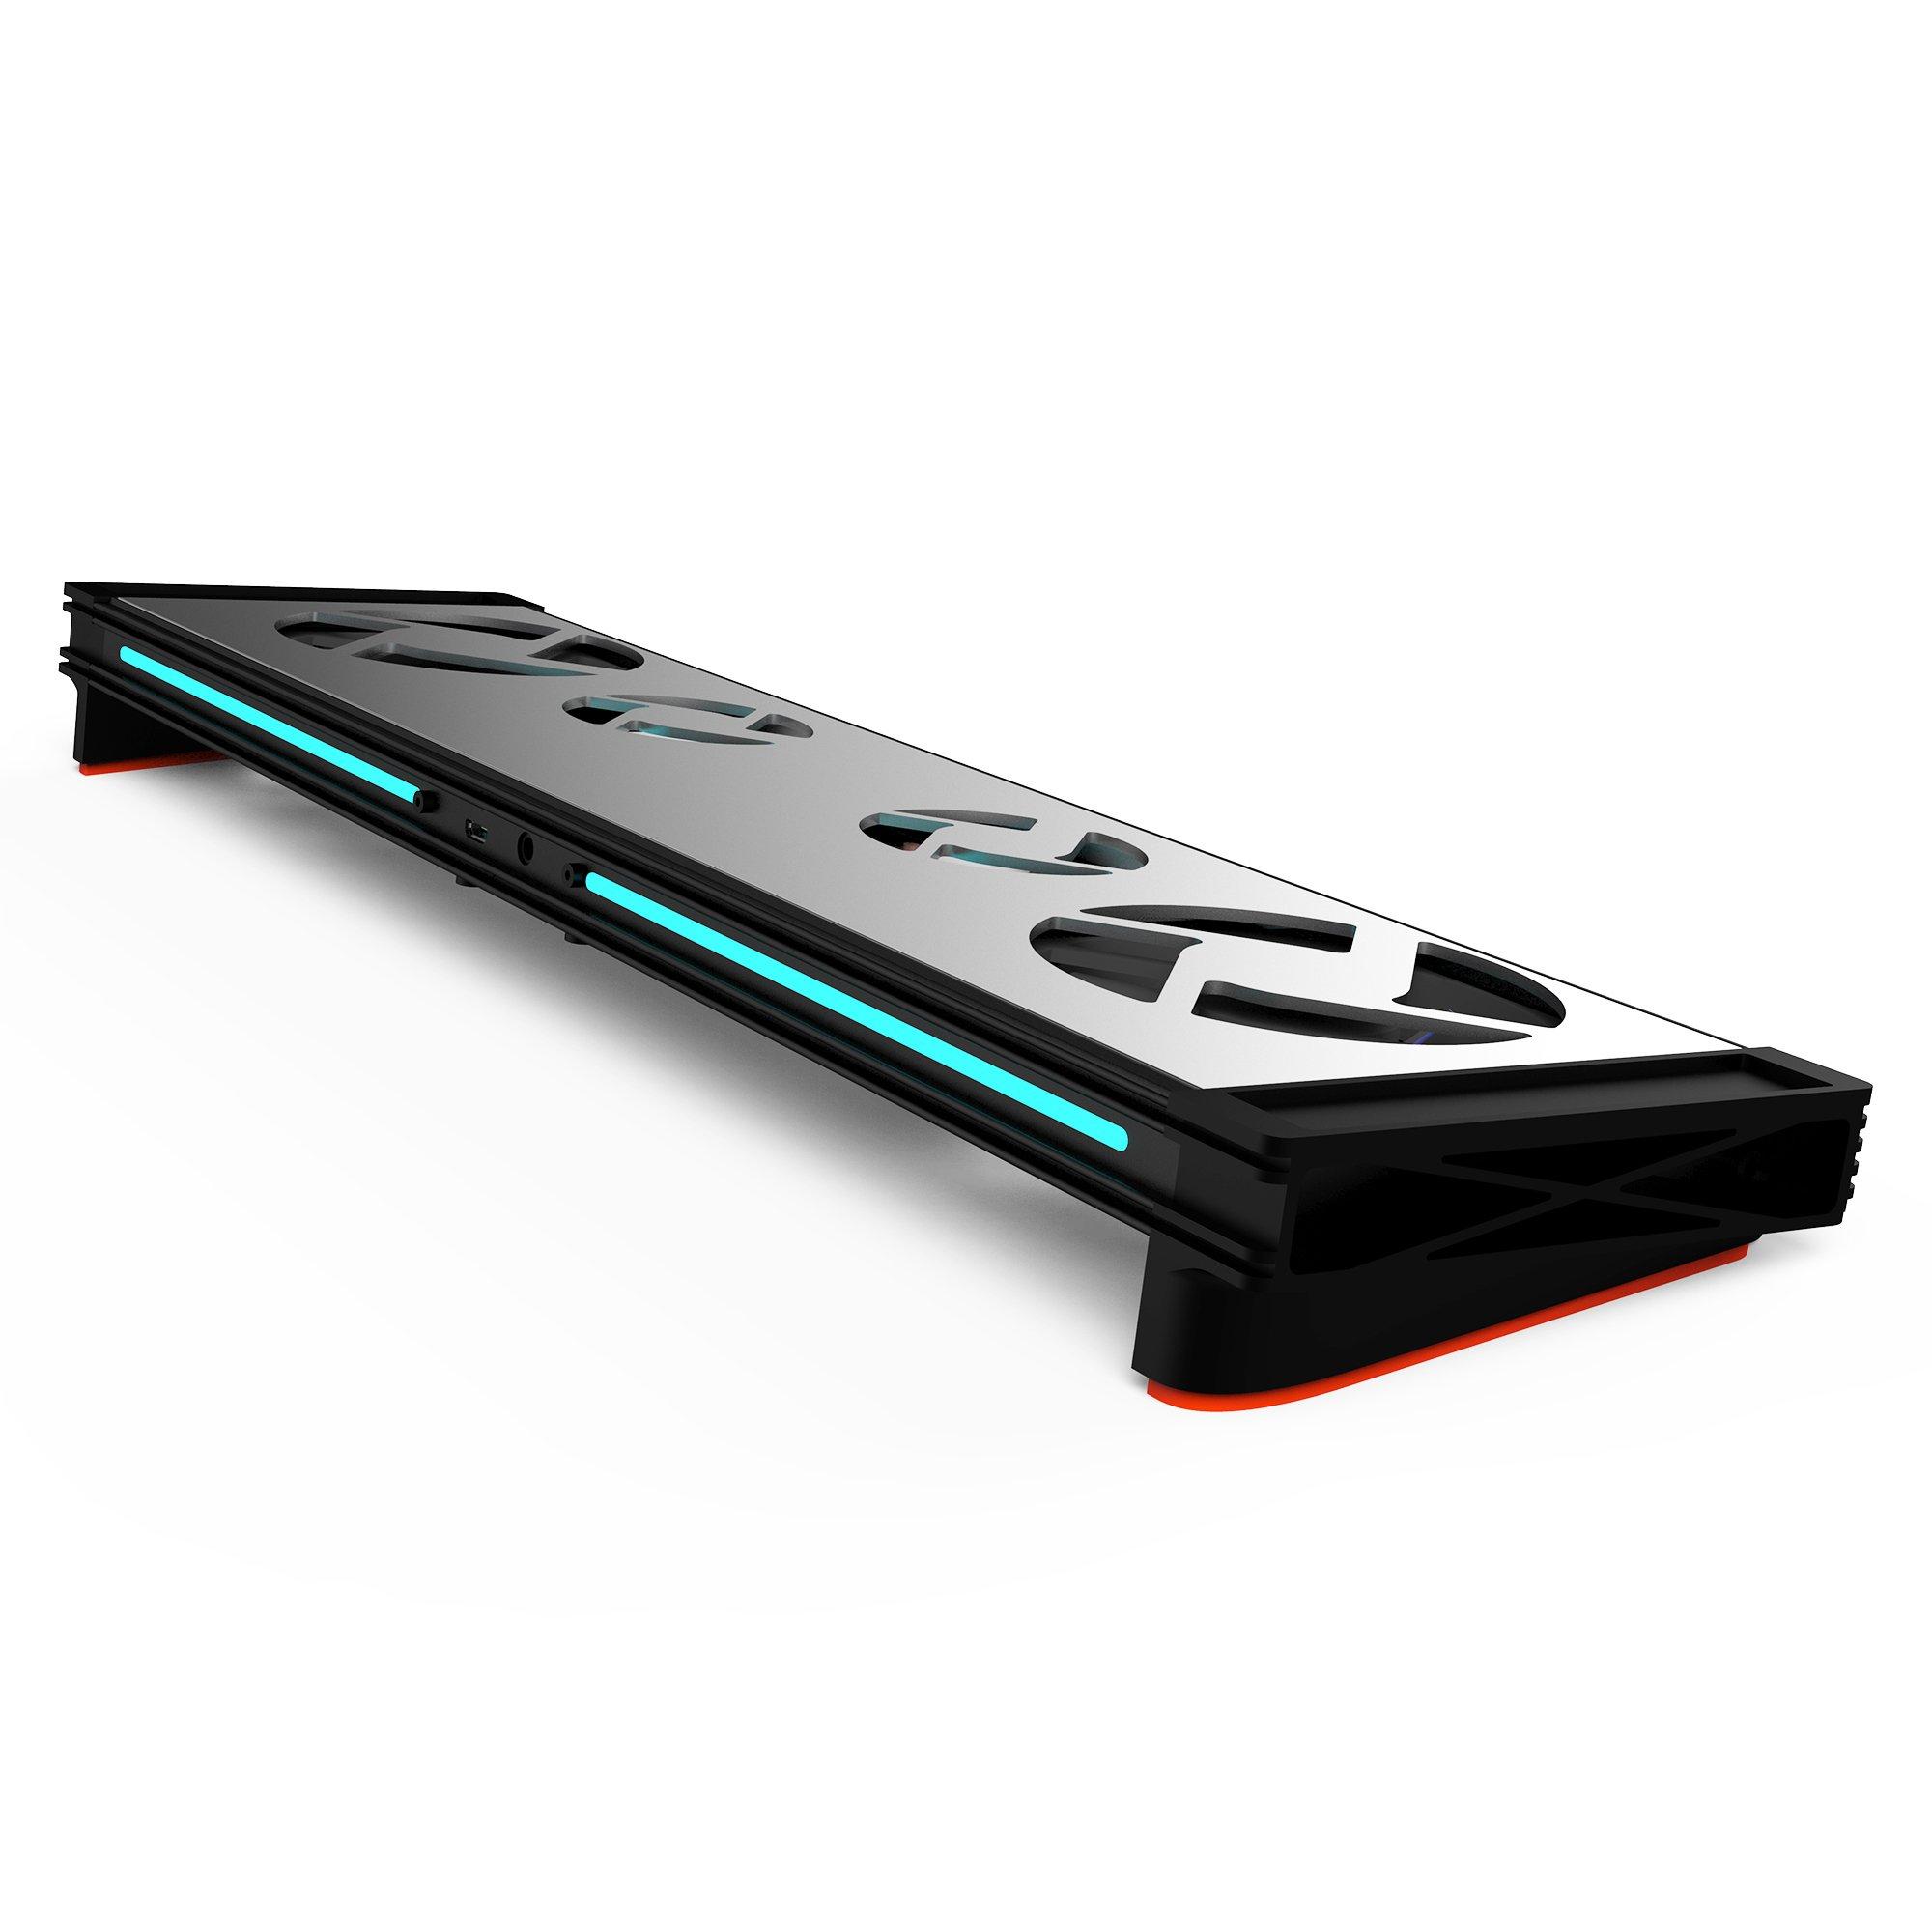 Smart Laptop Cooler for Alienware 17R4 (Newest Improved Edition)